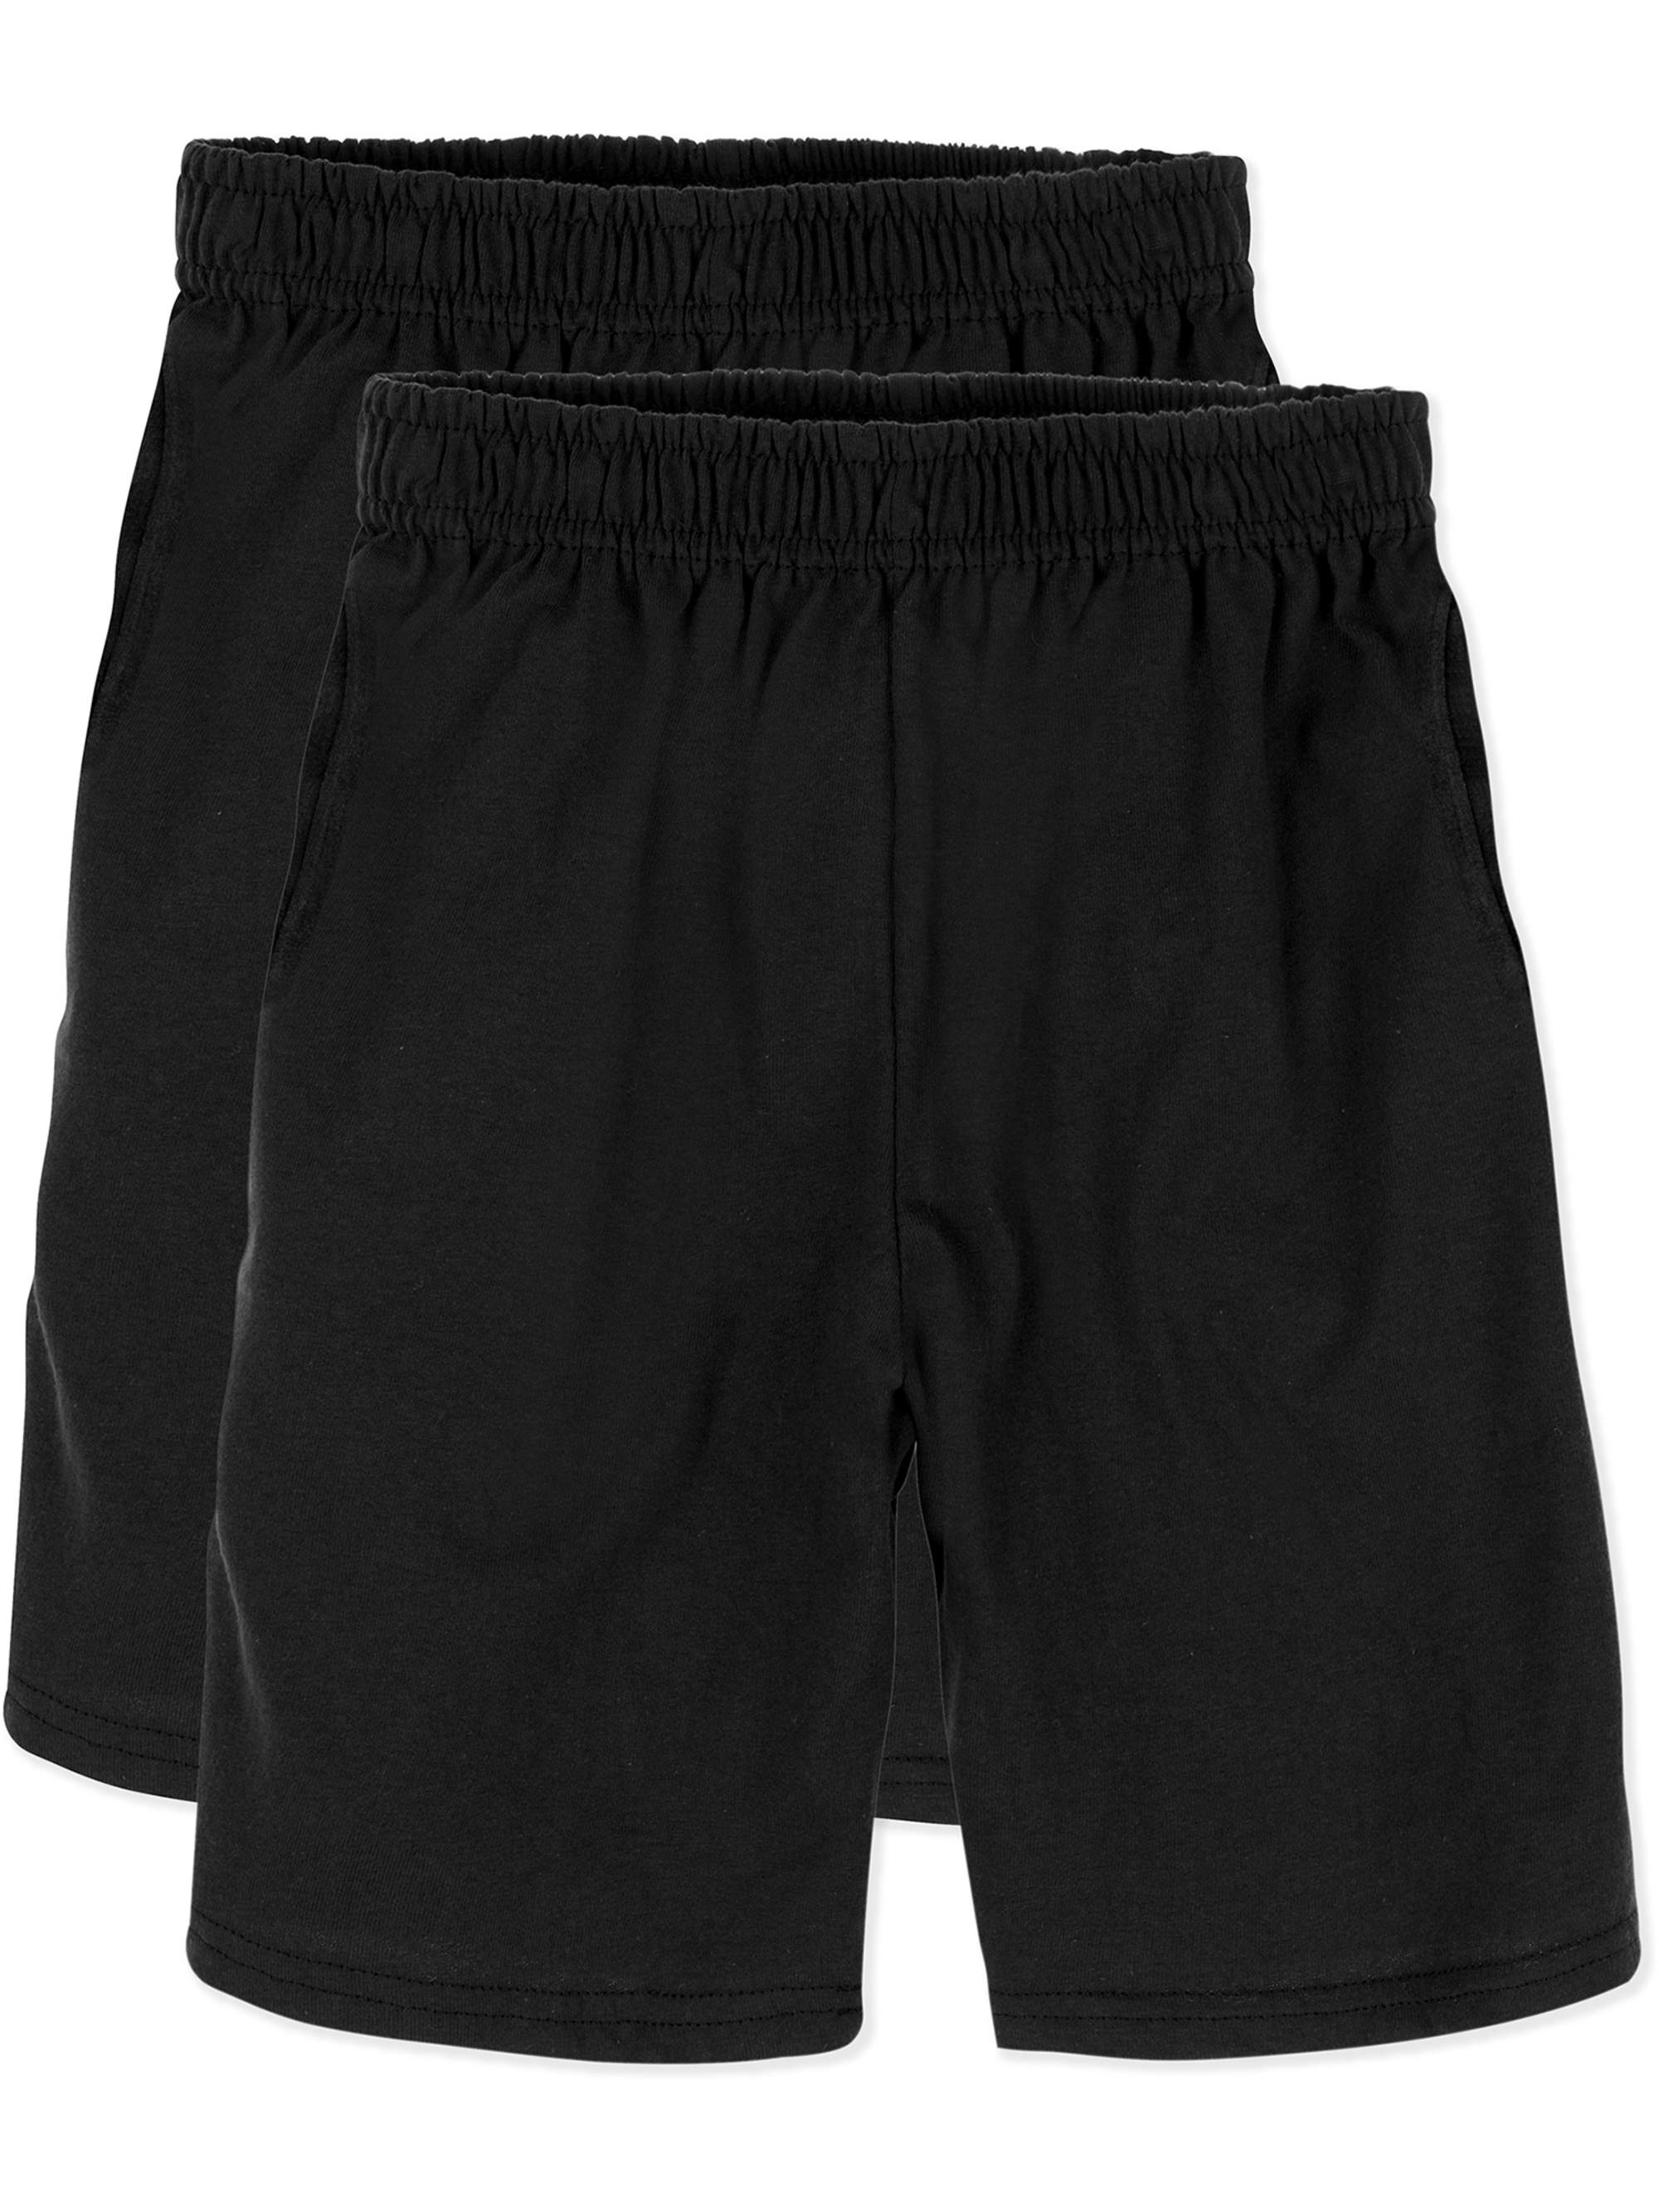 ComfortSoft Jersey Pocket Short, 2-Pack Set (Little Boys & Big Boys)